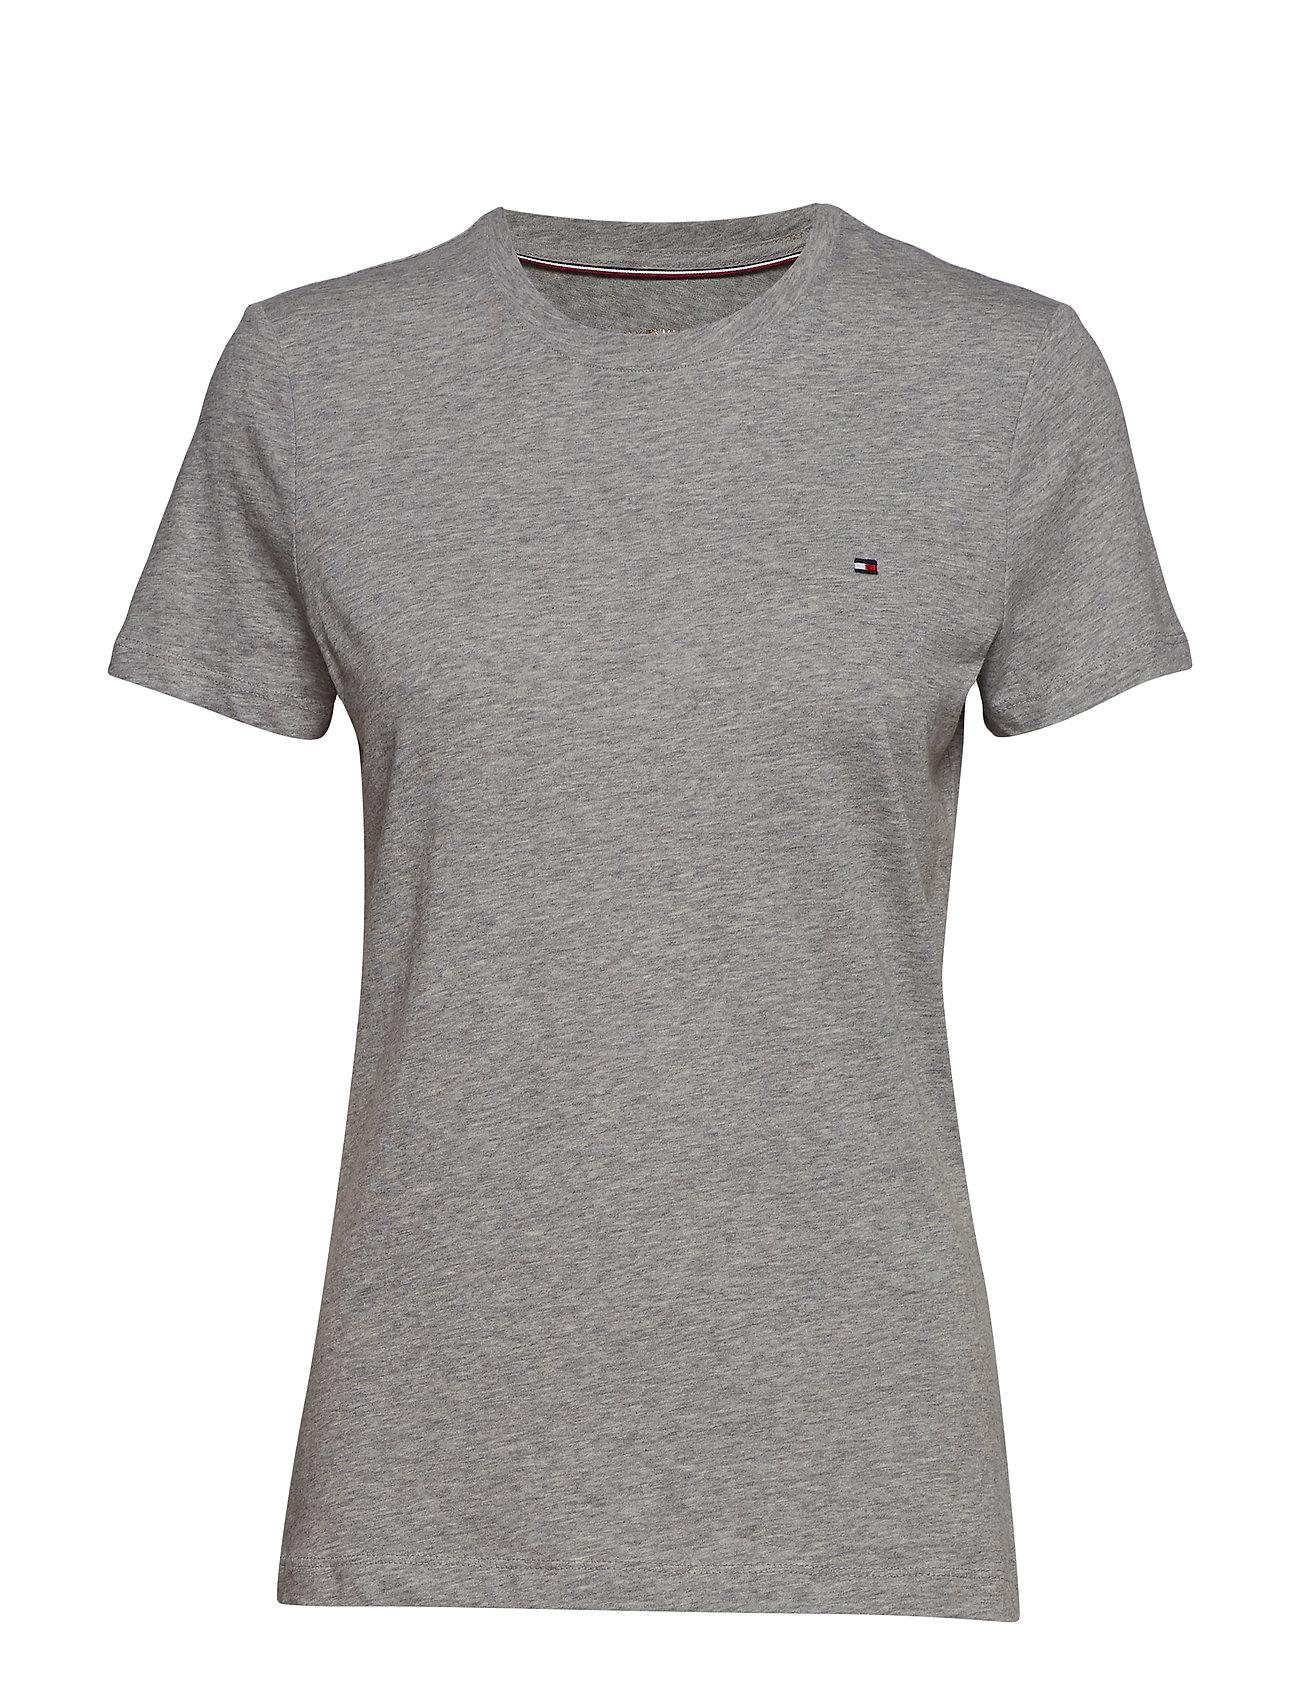 TOMMY HILFIGER Tommy Hilfiger Heritage T shirt Light White